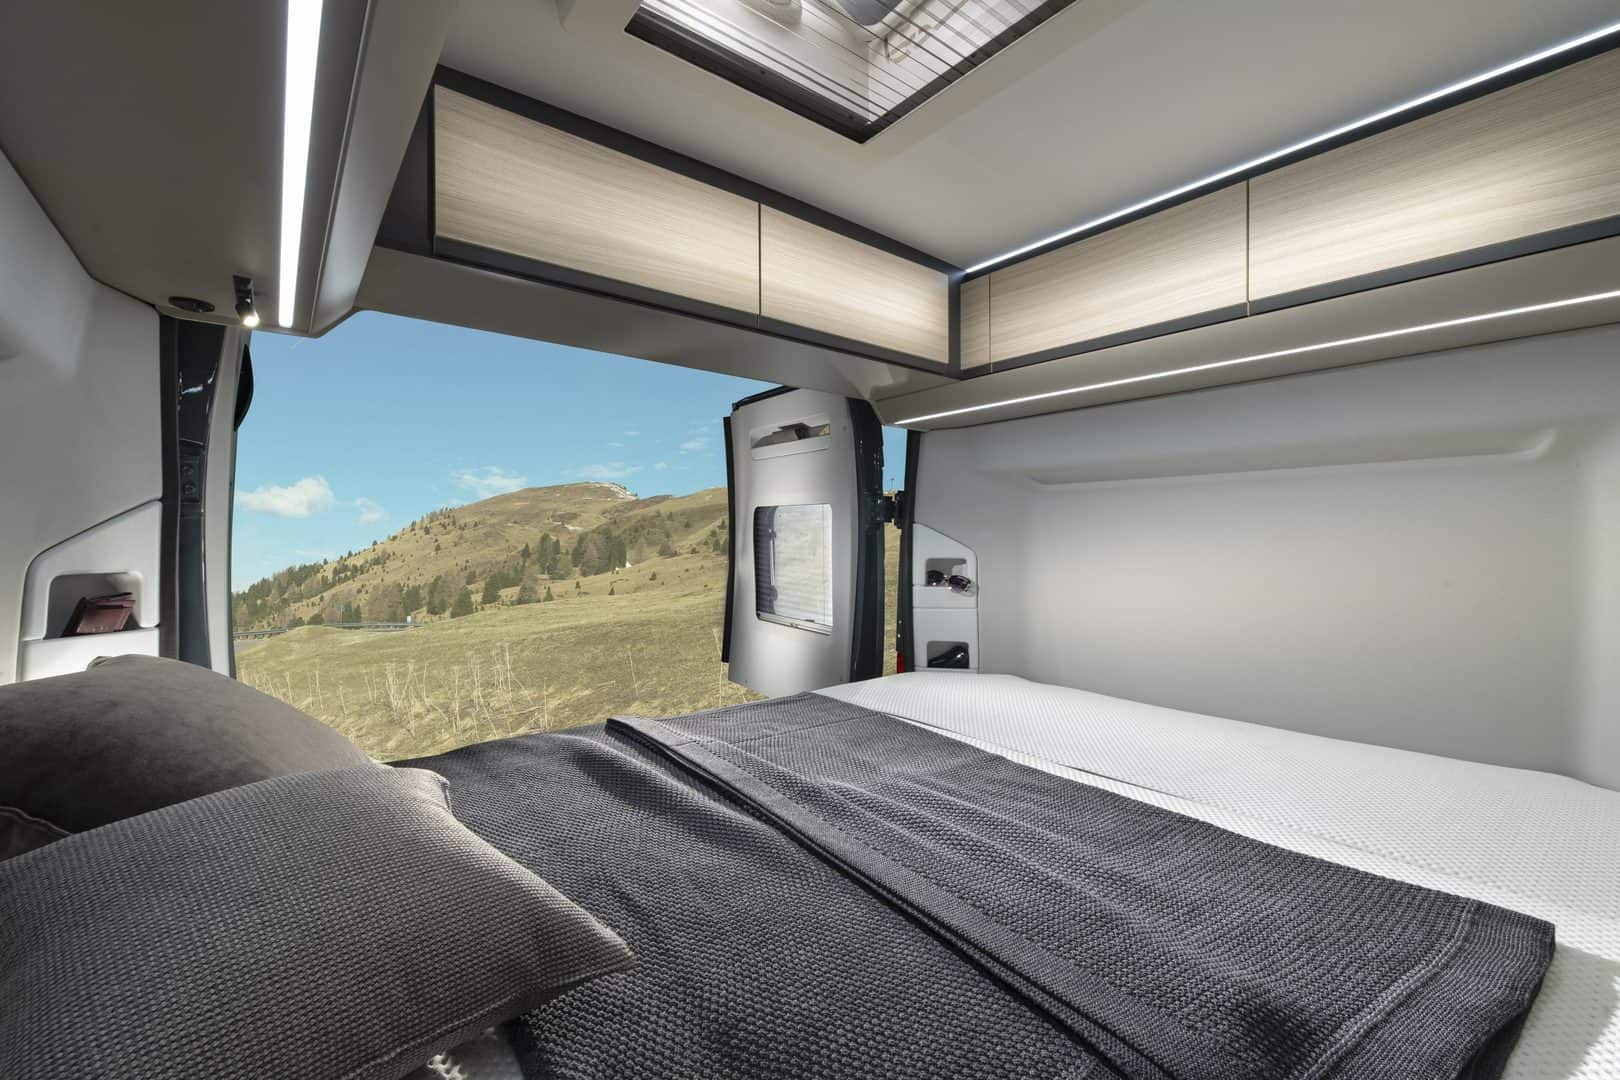 Adria Twin premiera Caravan Salon